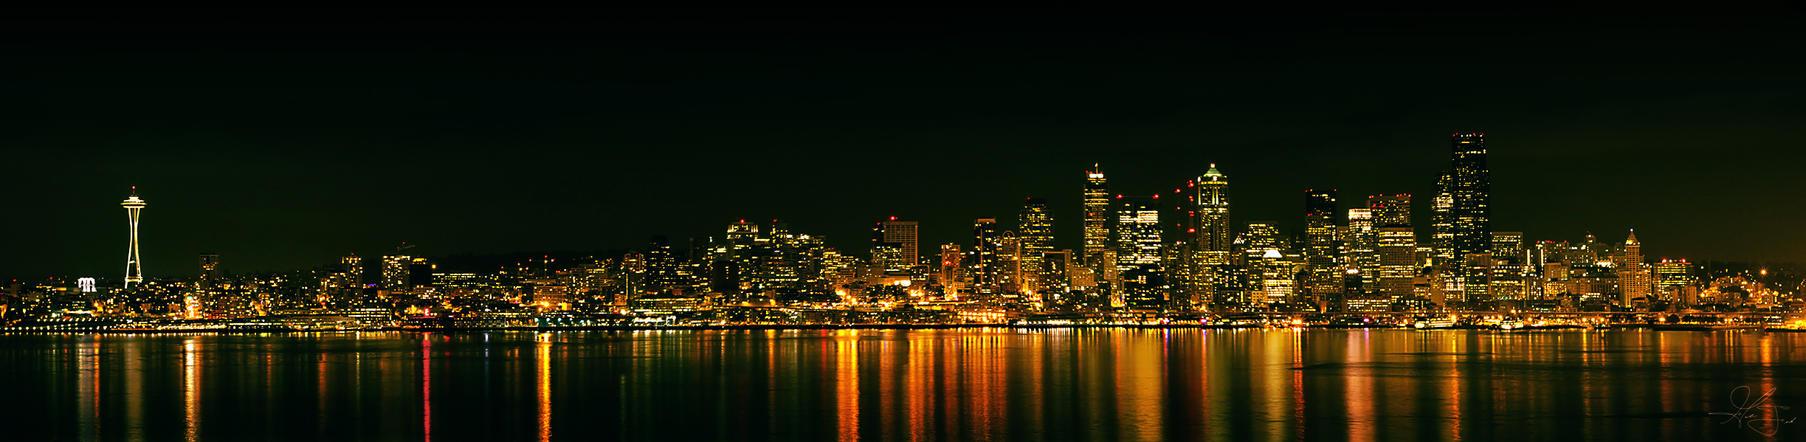 Seattle Night Skyline by ThatFunk